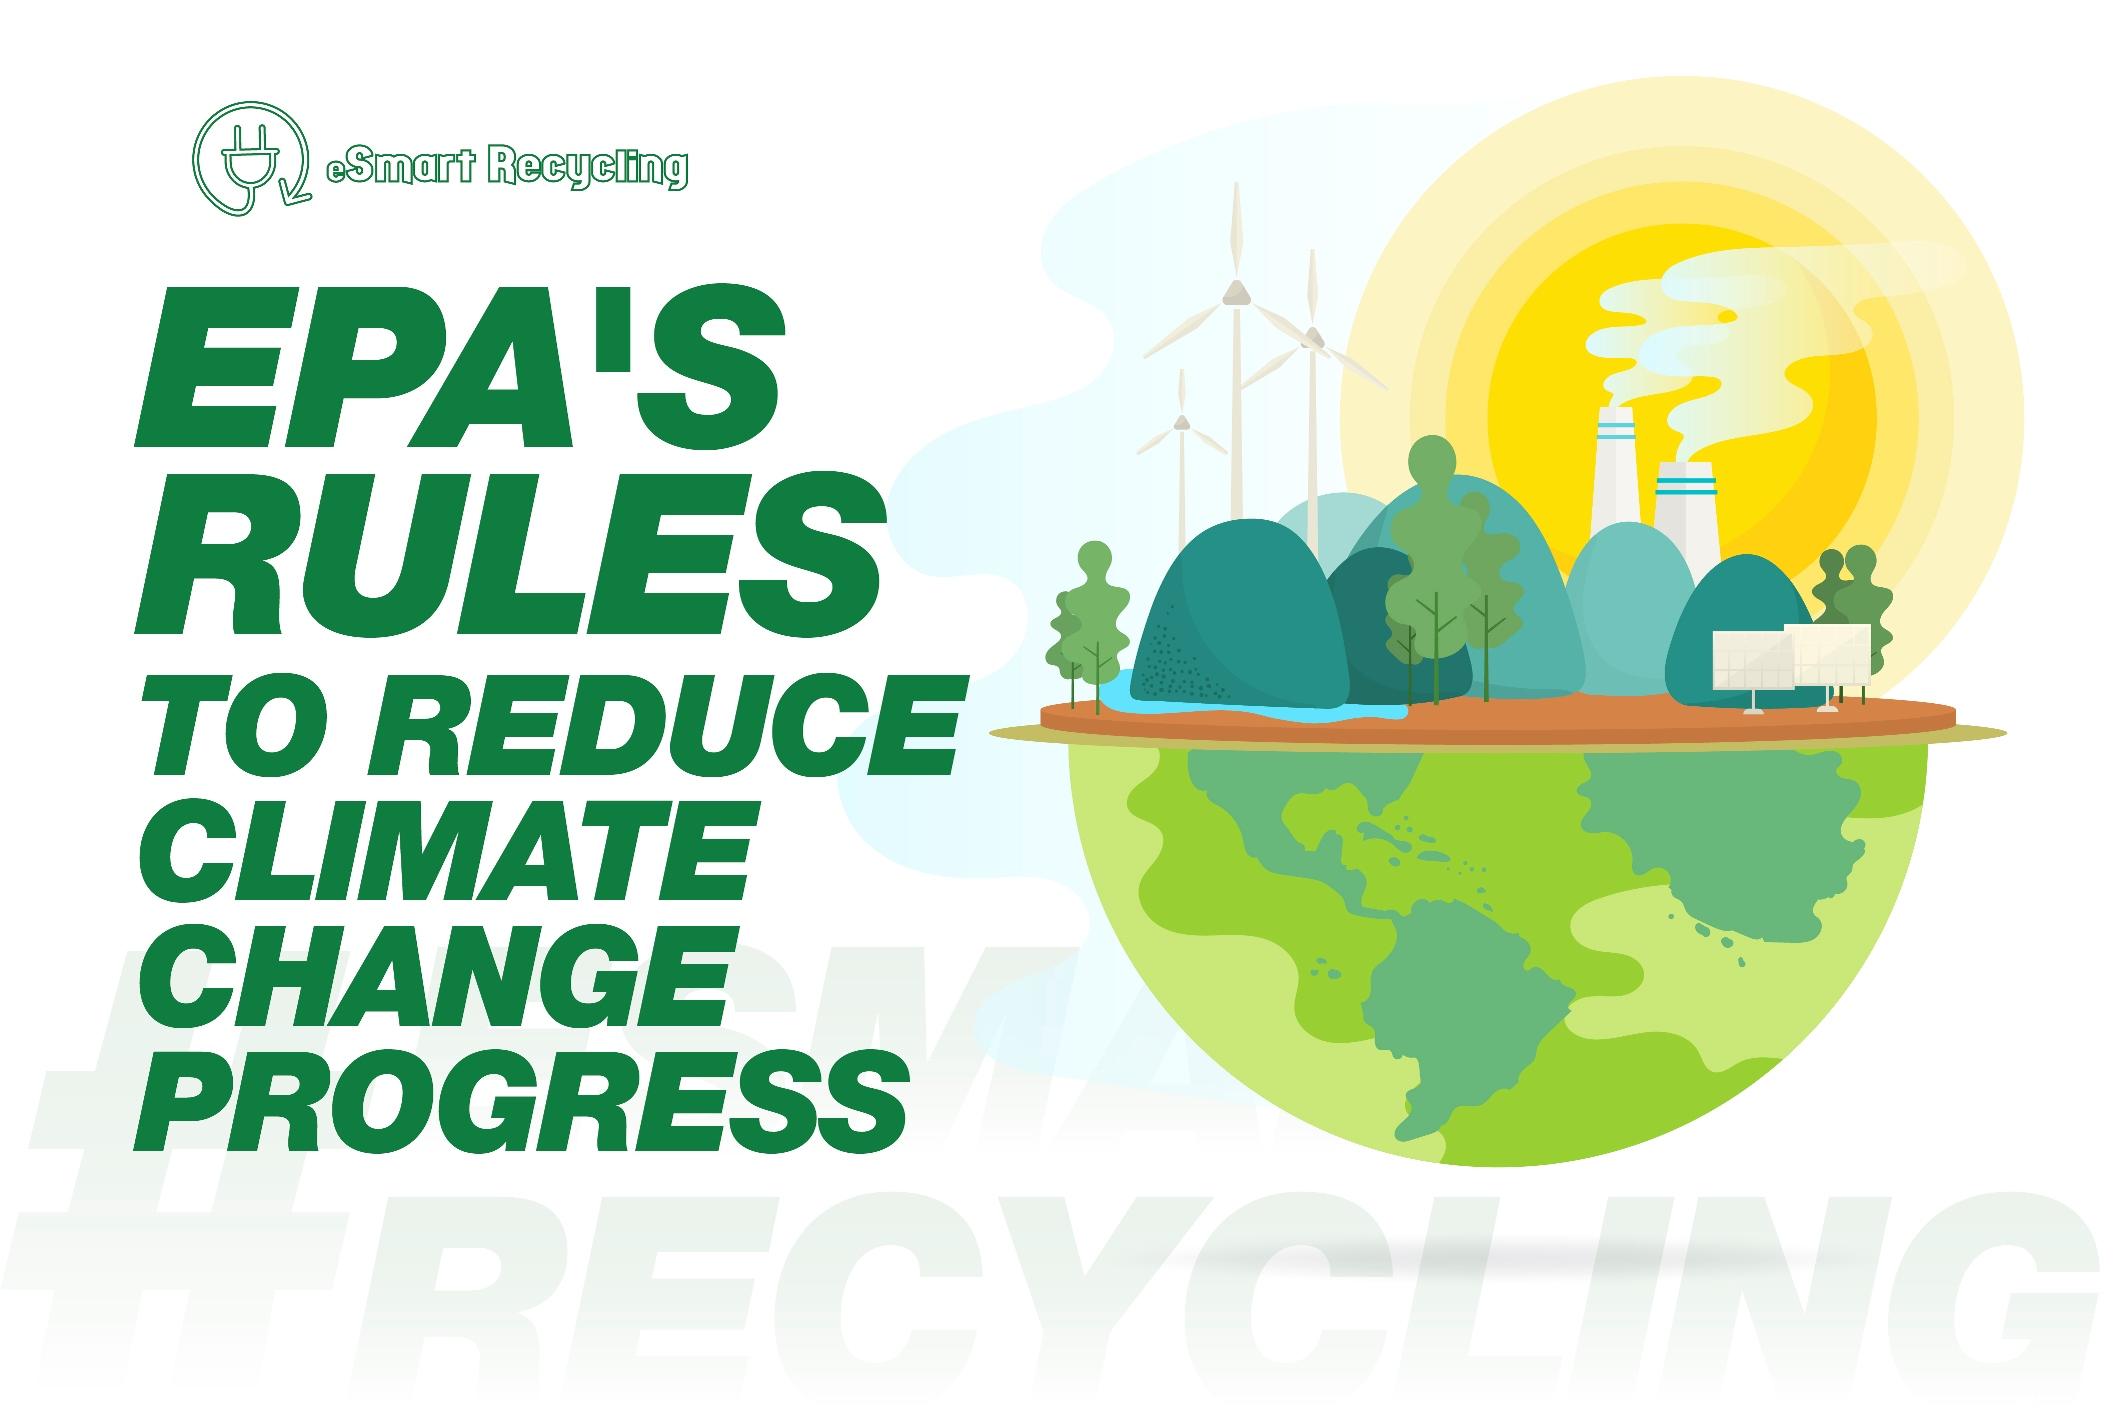 climate change progress